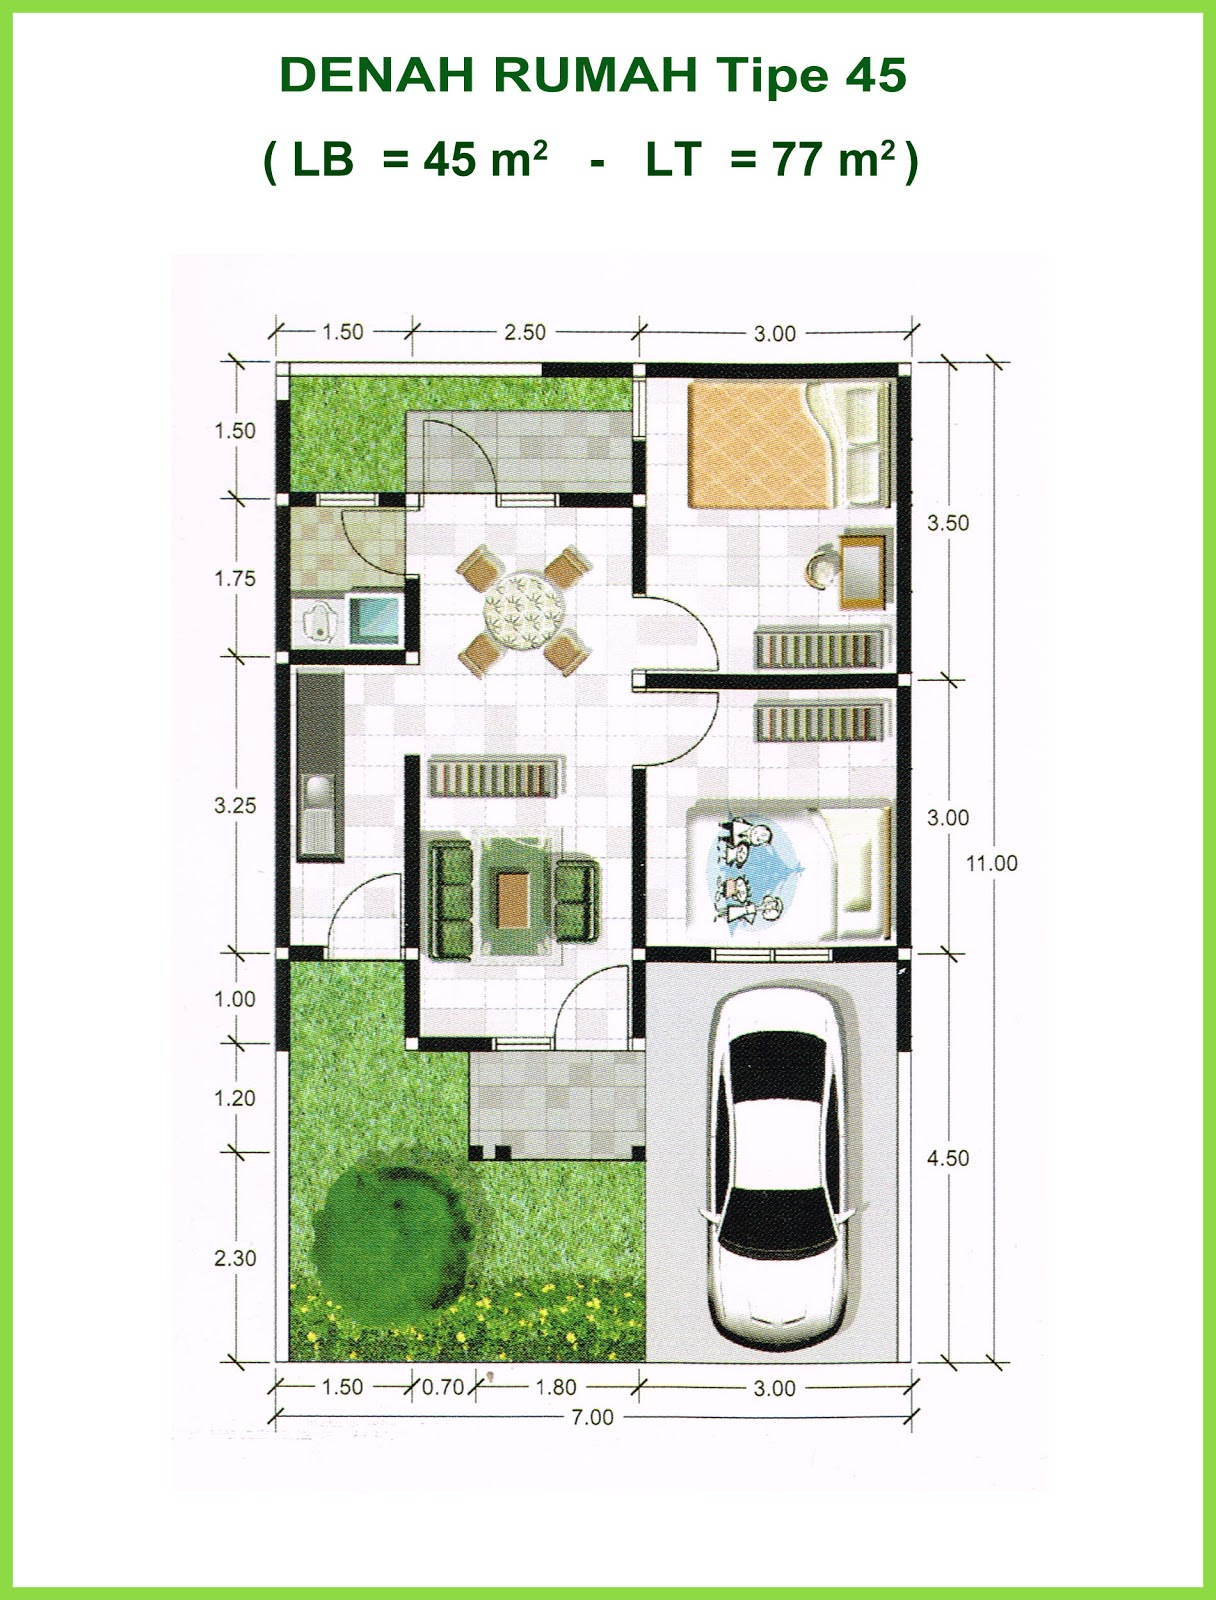 Denahose Rancangan Denah Rumah Type 36 Huk